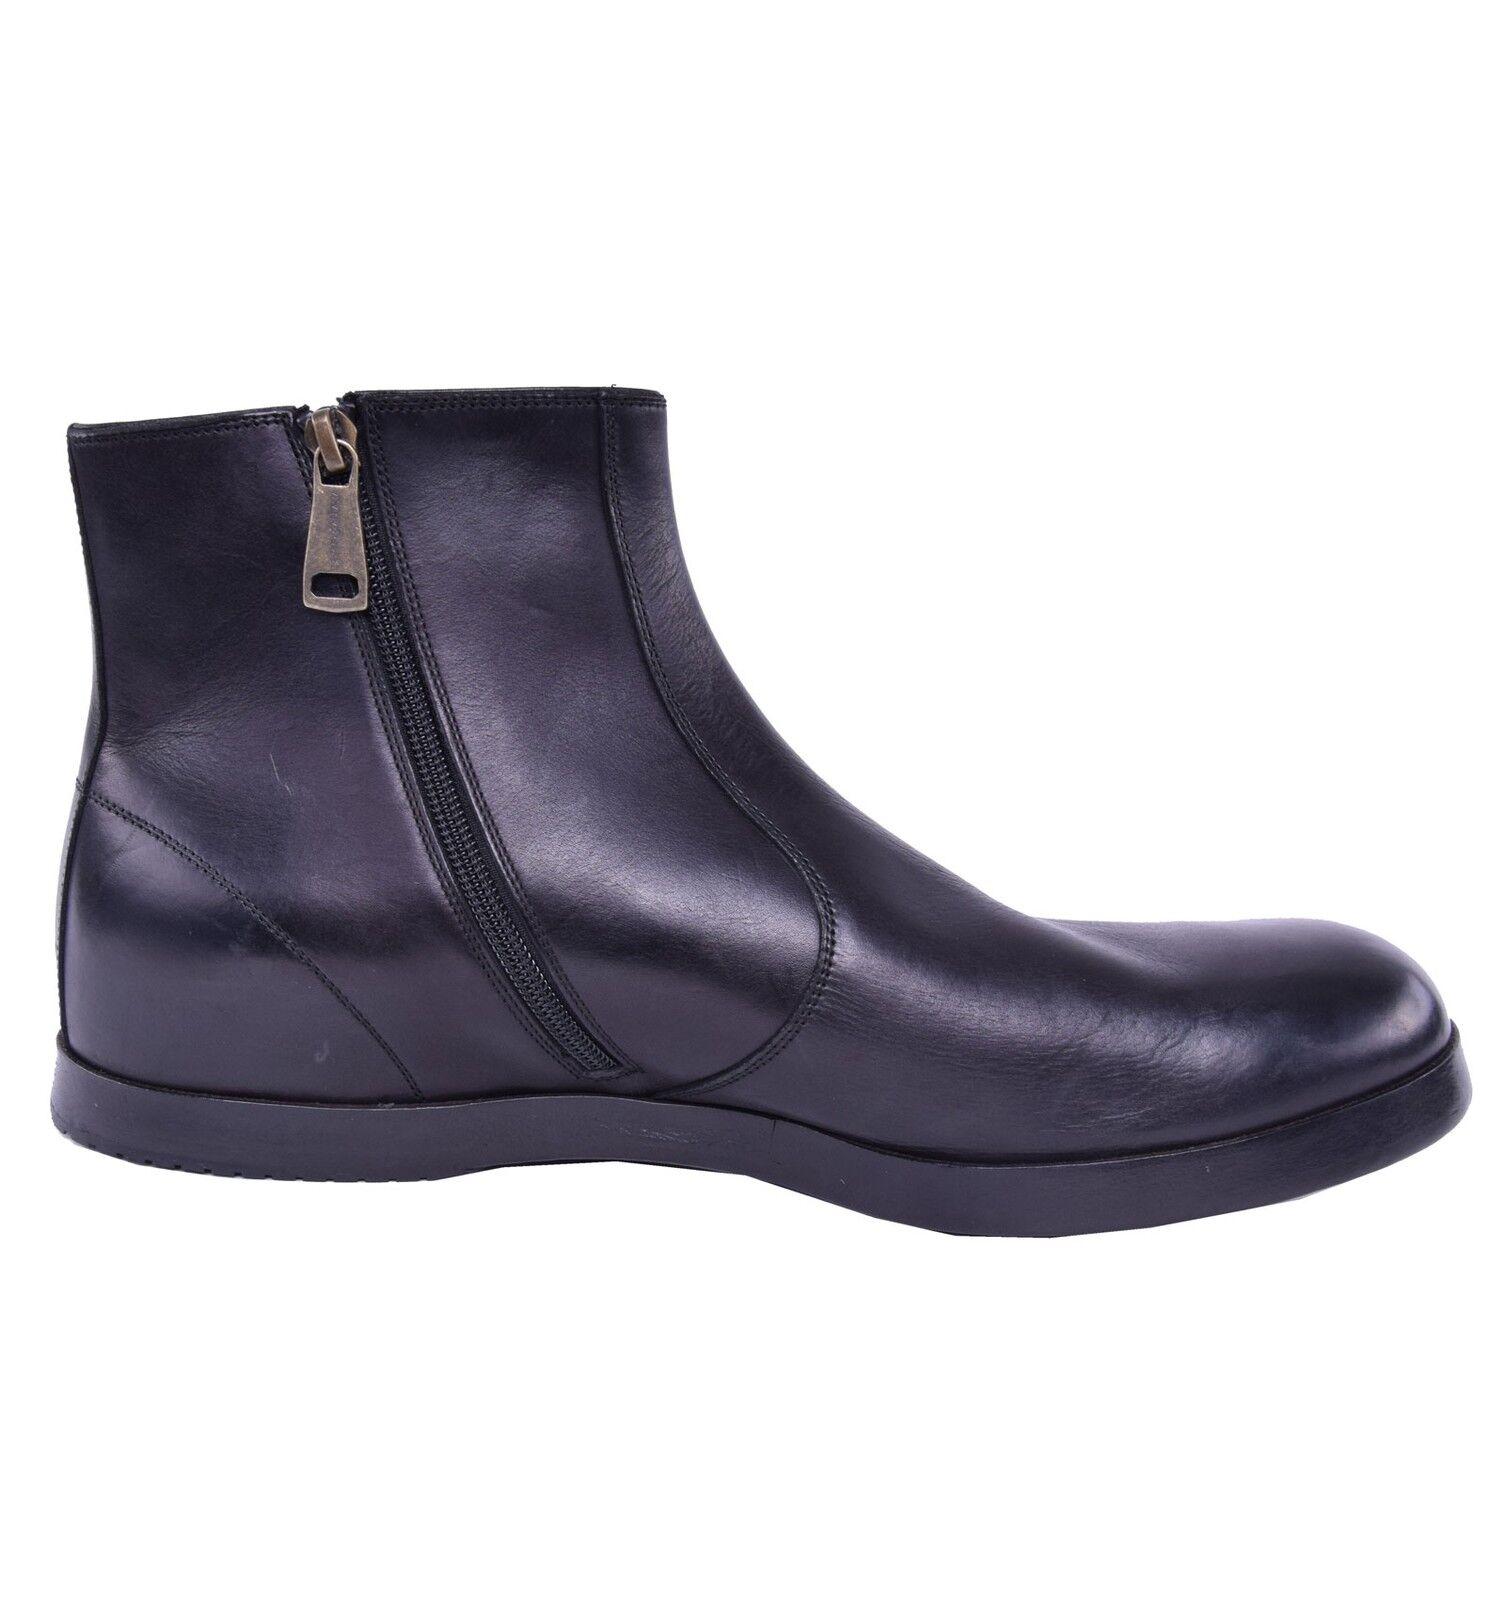 DOLCE & GABBANA Zip Closure Boots Shoes Mat Black 03832